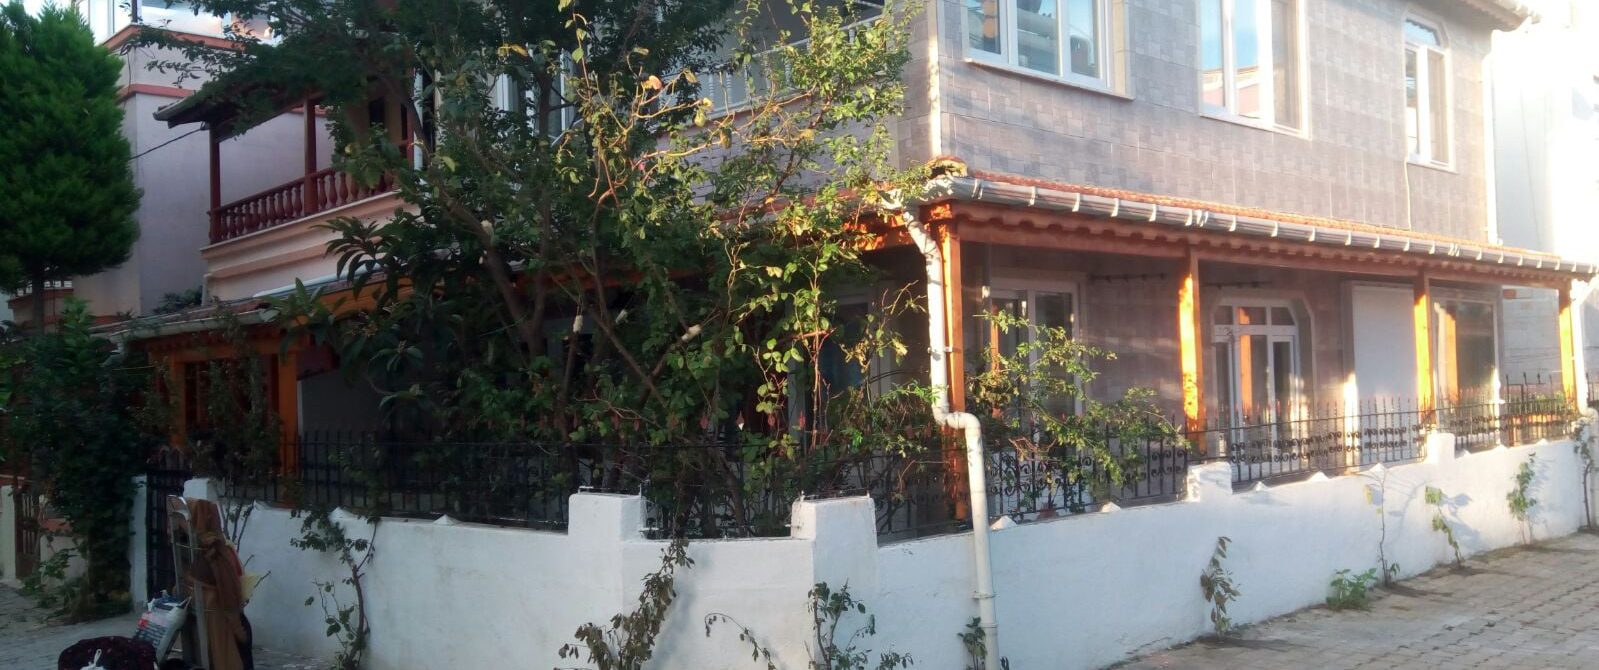 Avşa Adasında Dublex Daire - Duplex Apartment in Avsa Island